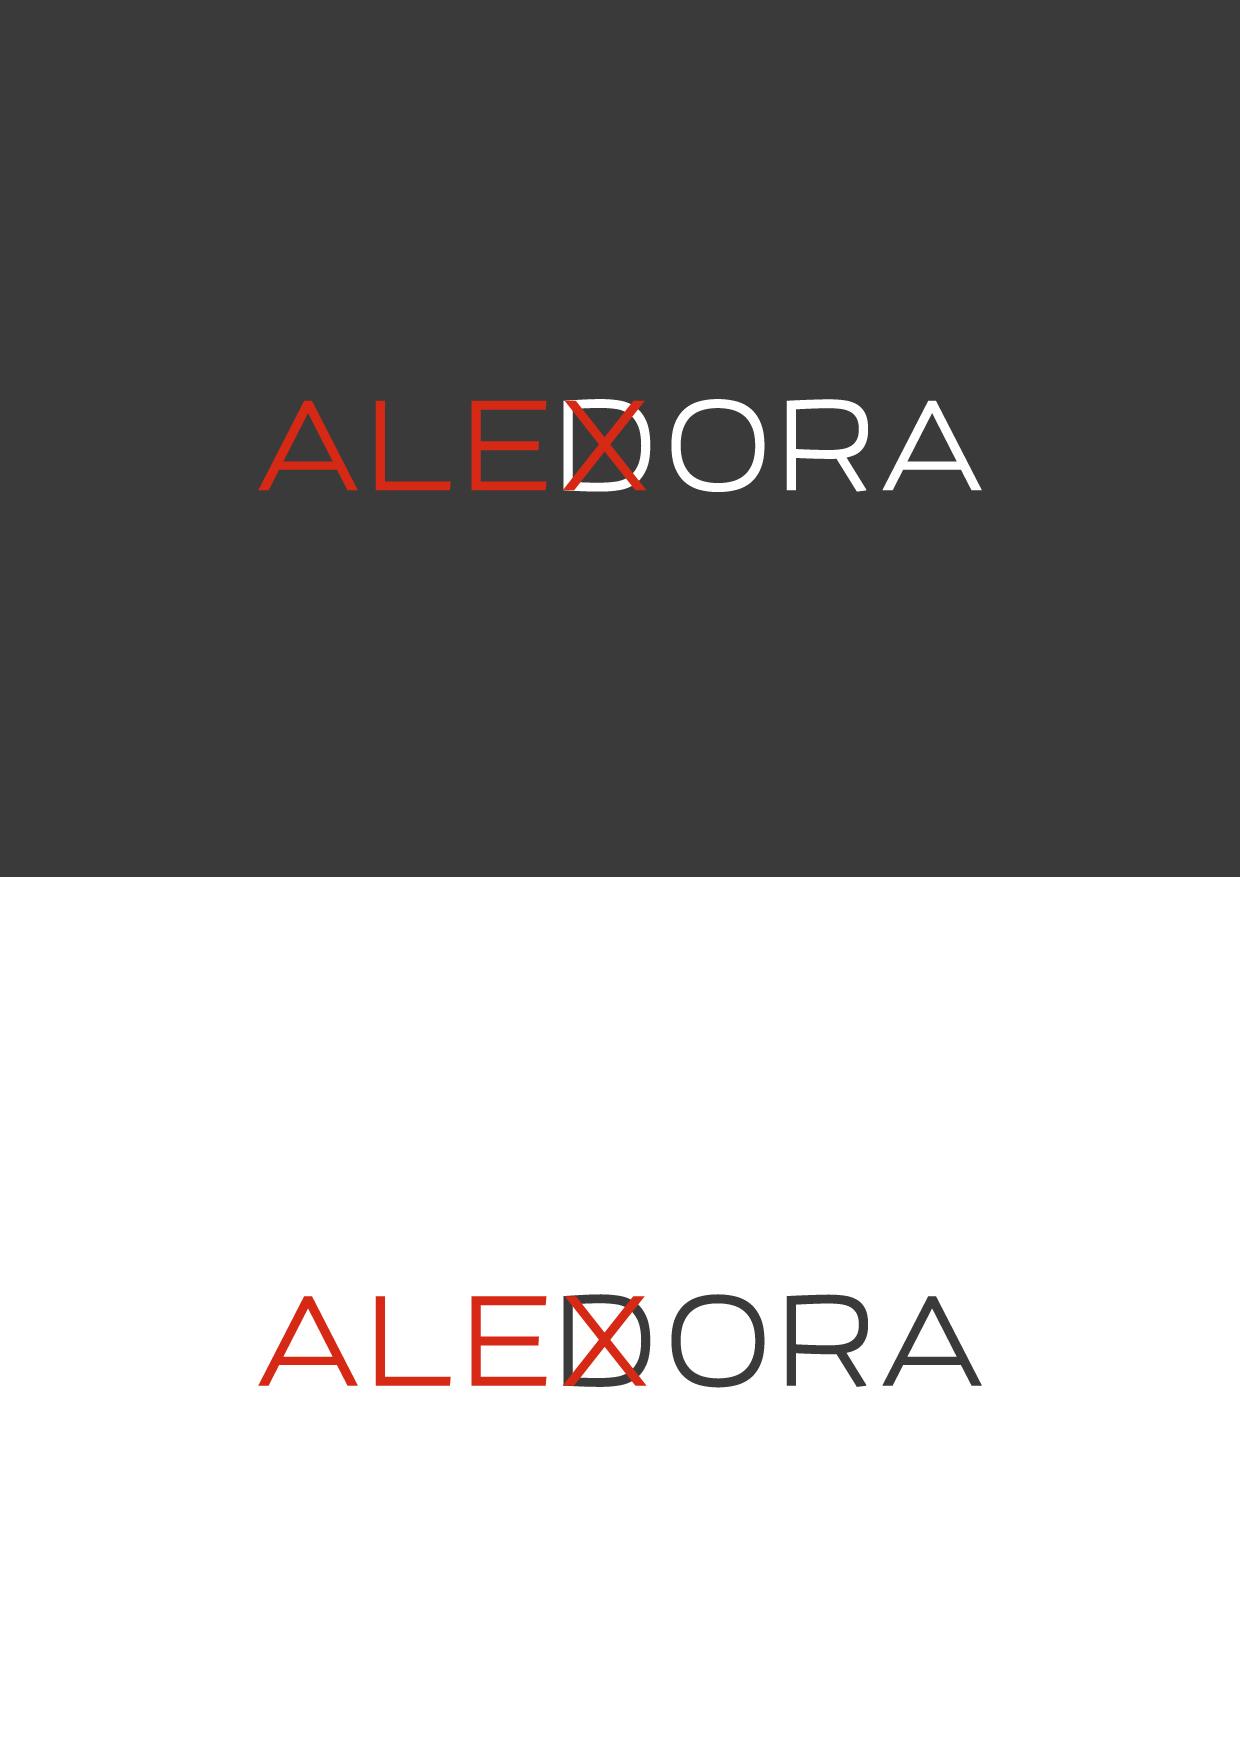 Необходим дизайнер для доработки логотипа бренда одежды фото f_7255b366ded74f2b.jpg